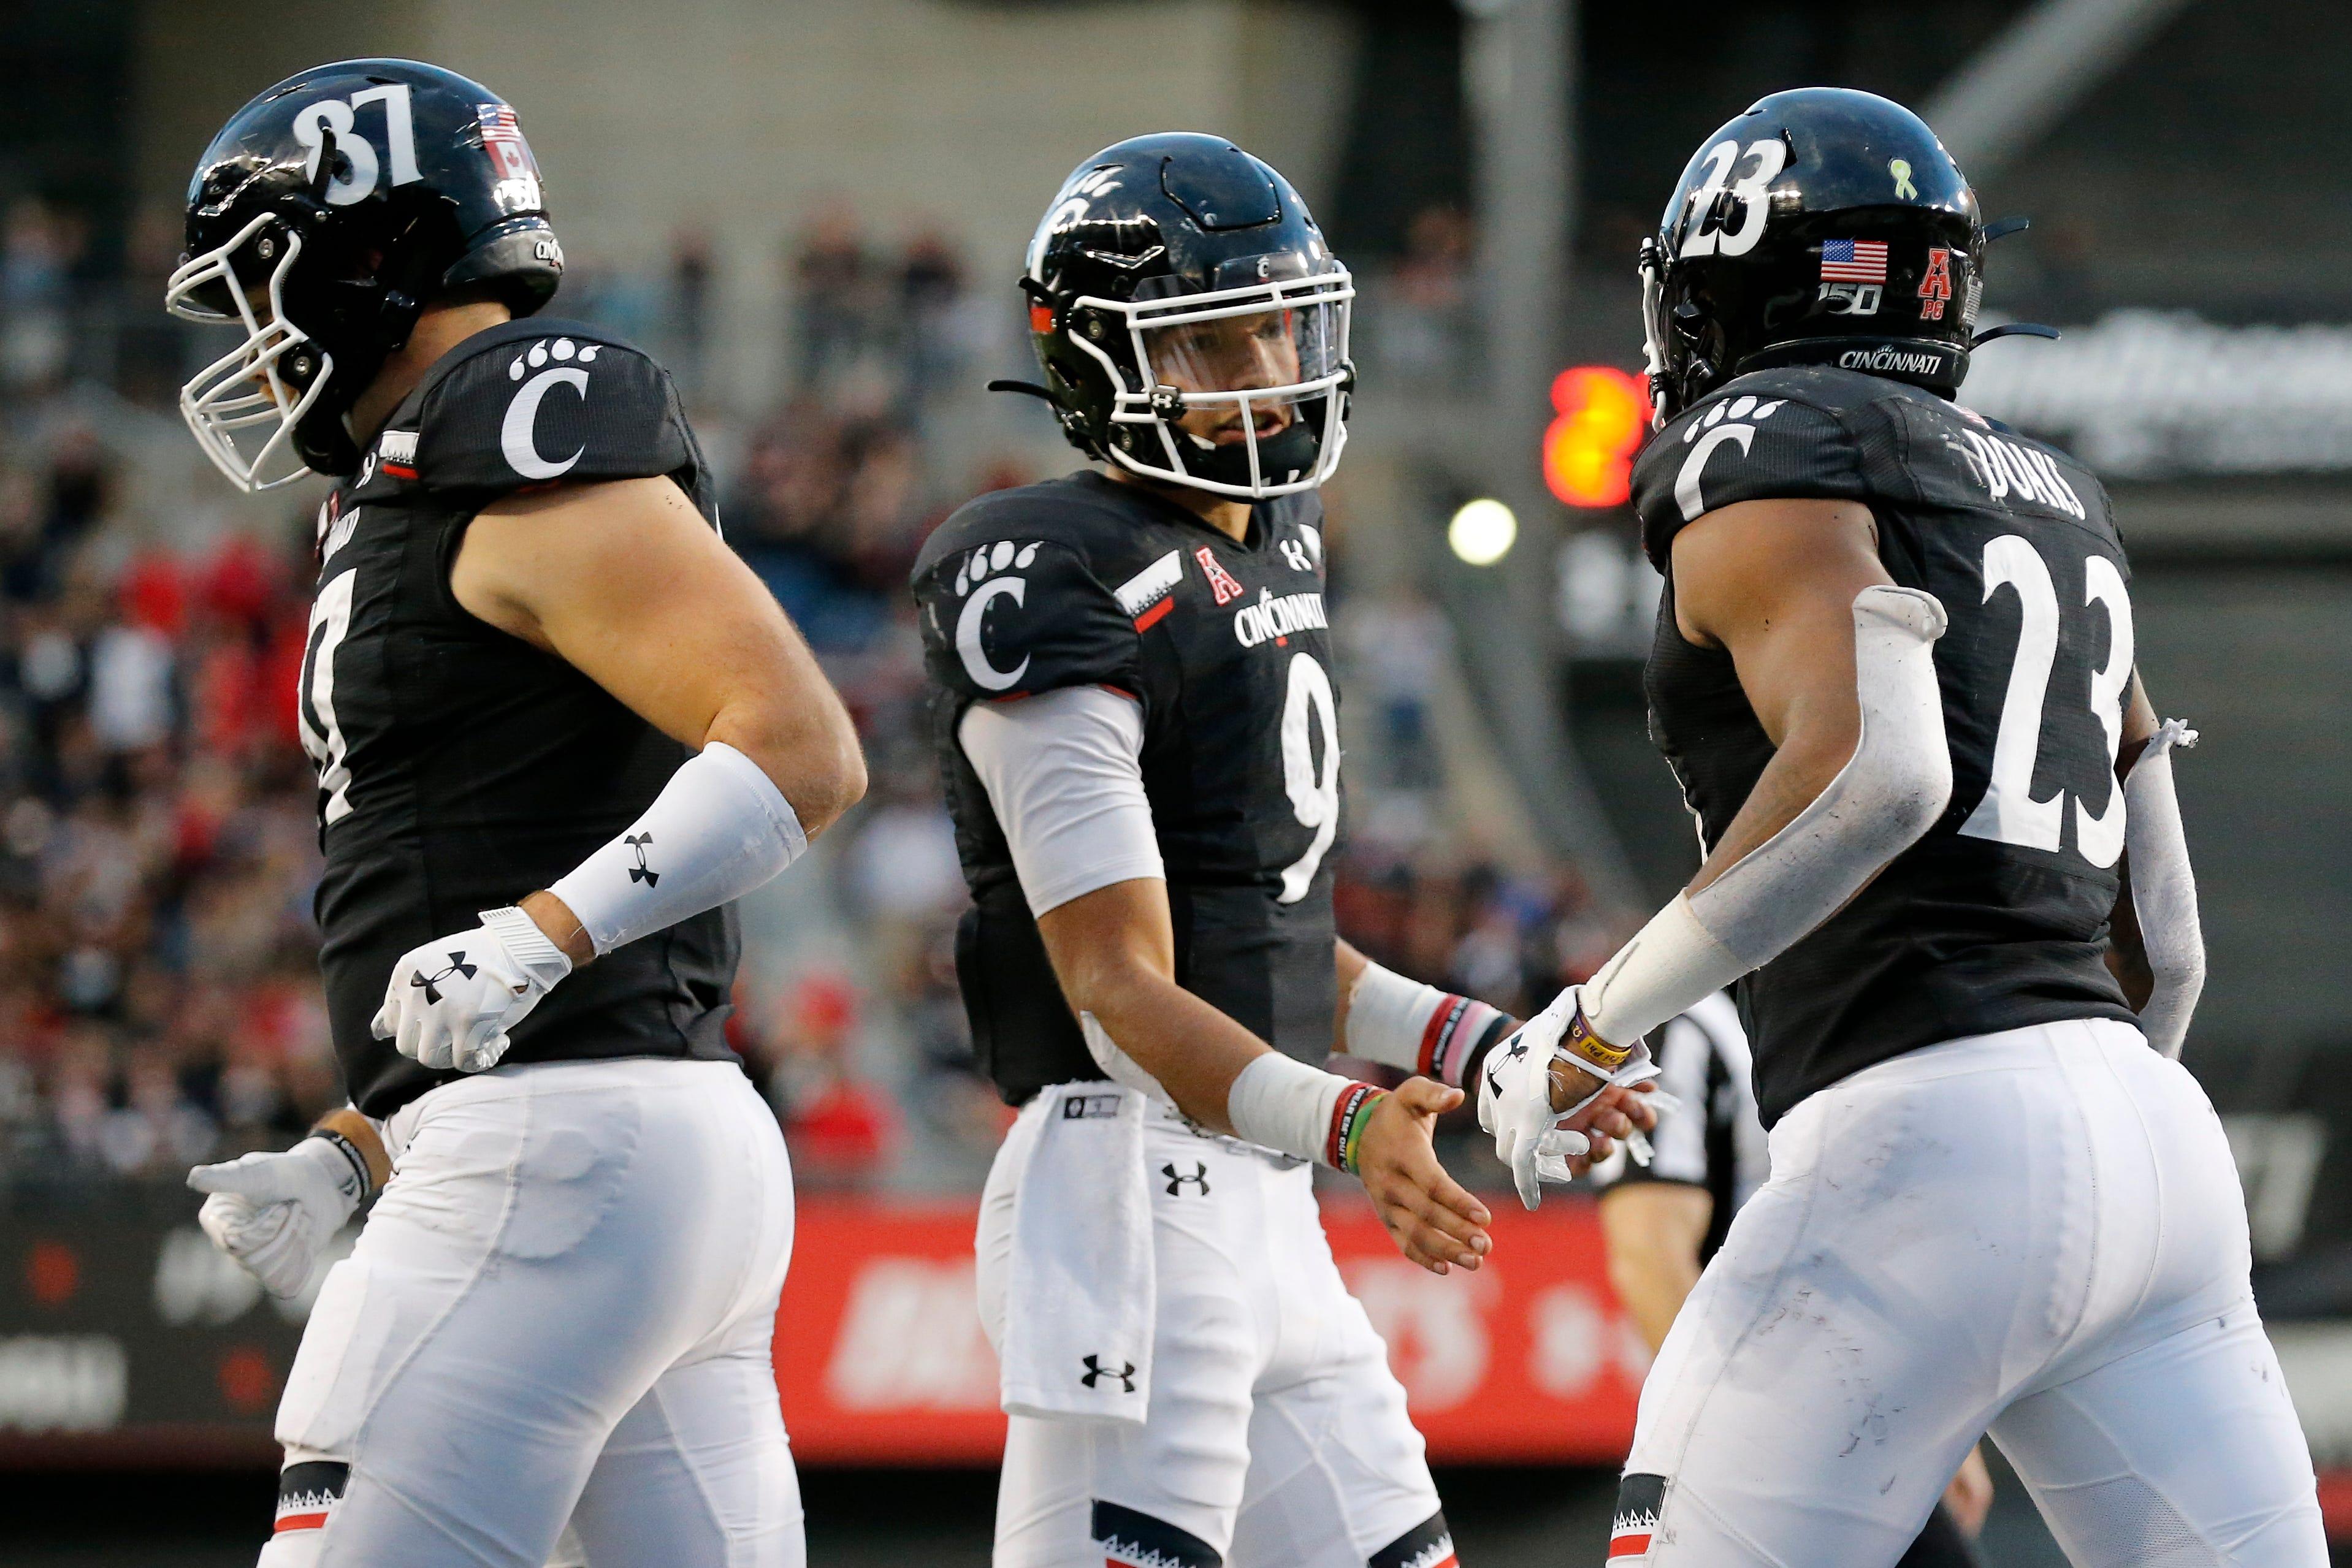 Cincinnati Bearcats Football Projected Offensive Starters For 2020